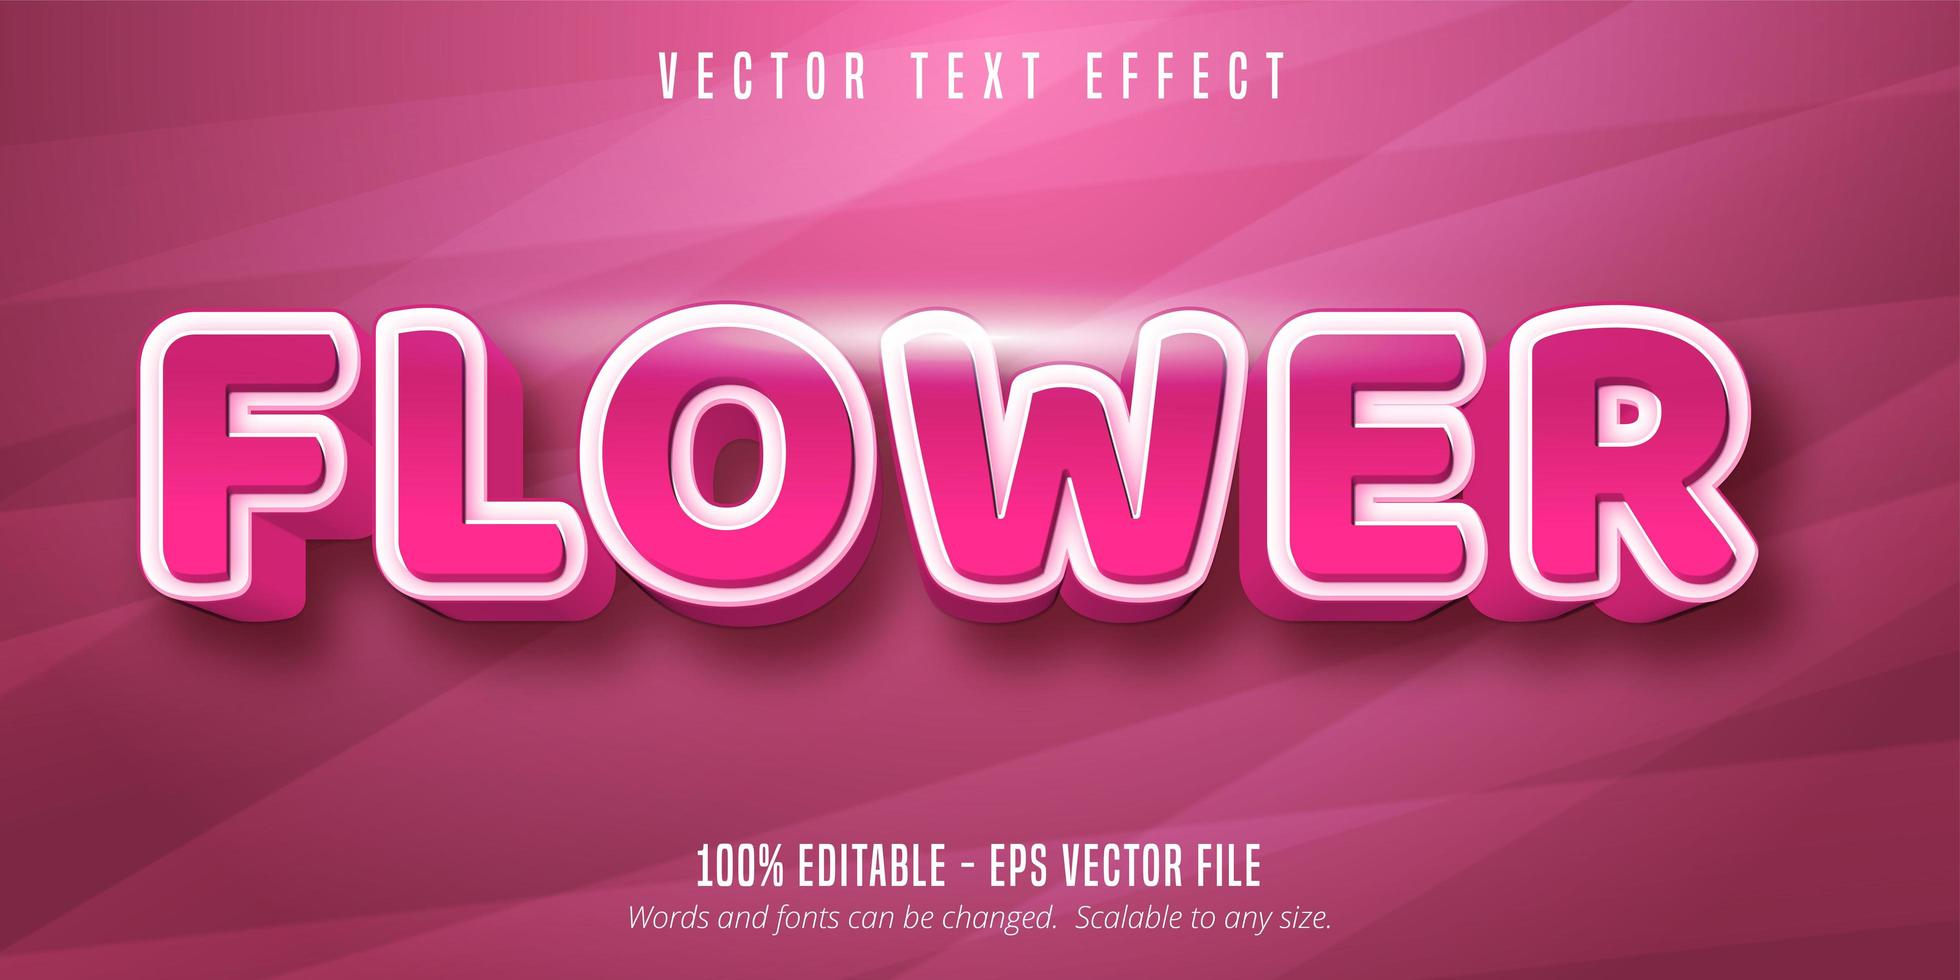 efecto de texto editable de color rosa flor vector